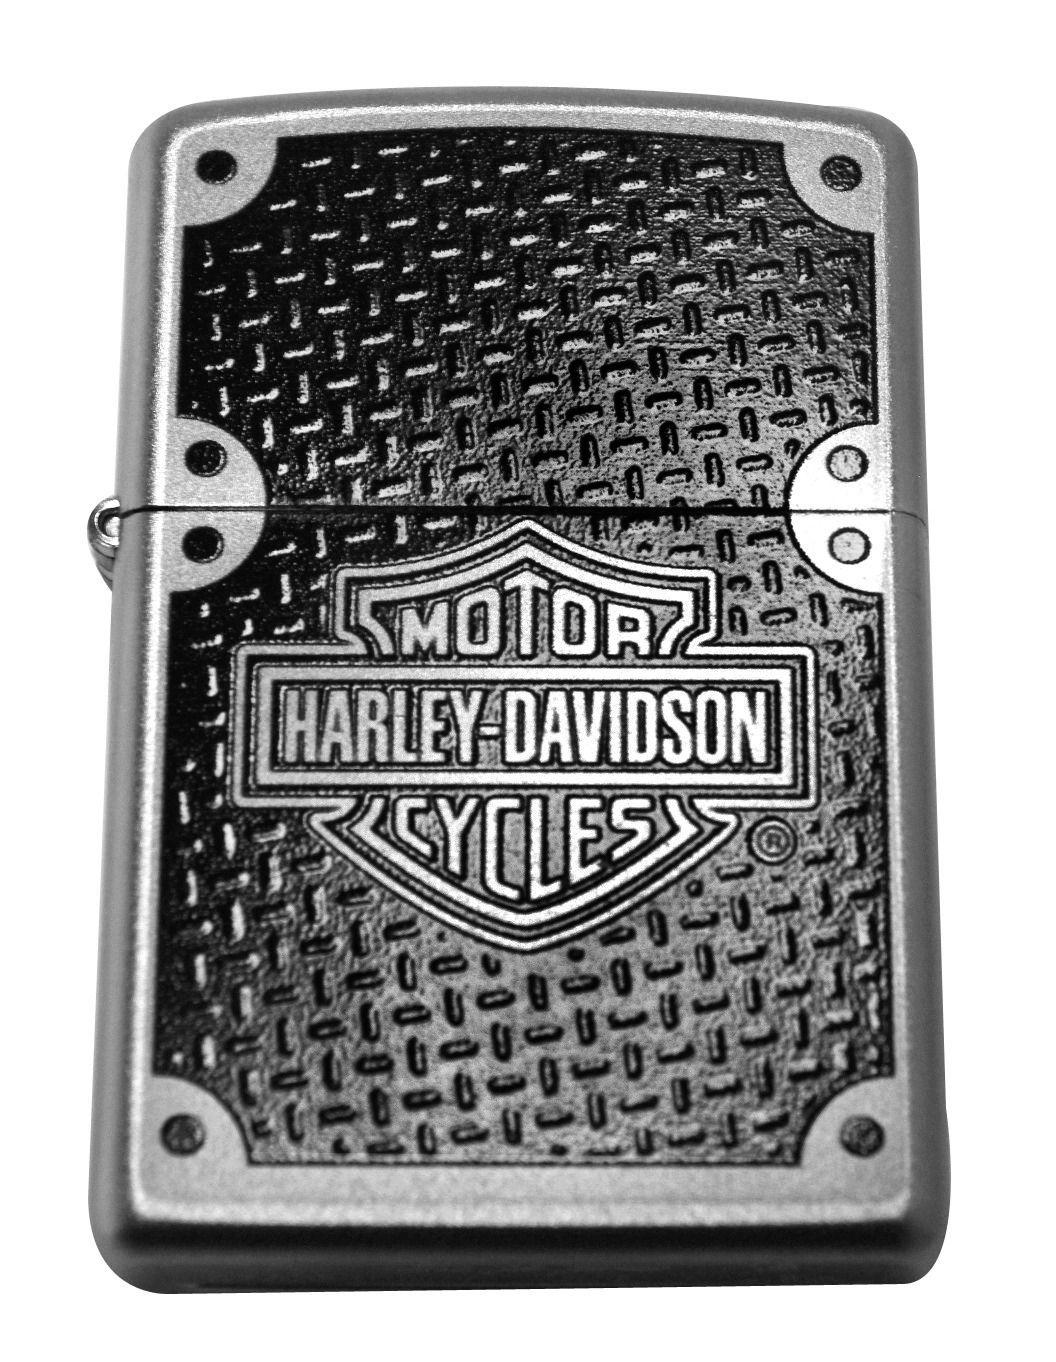 Zippo lighter 24025 harley davidson carbon satin chrome windproof NEW